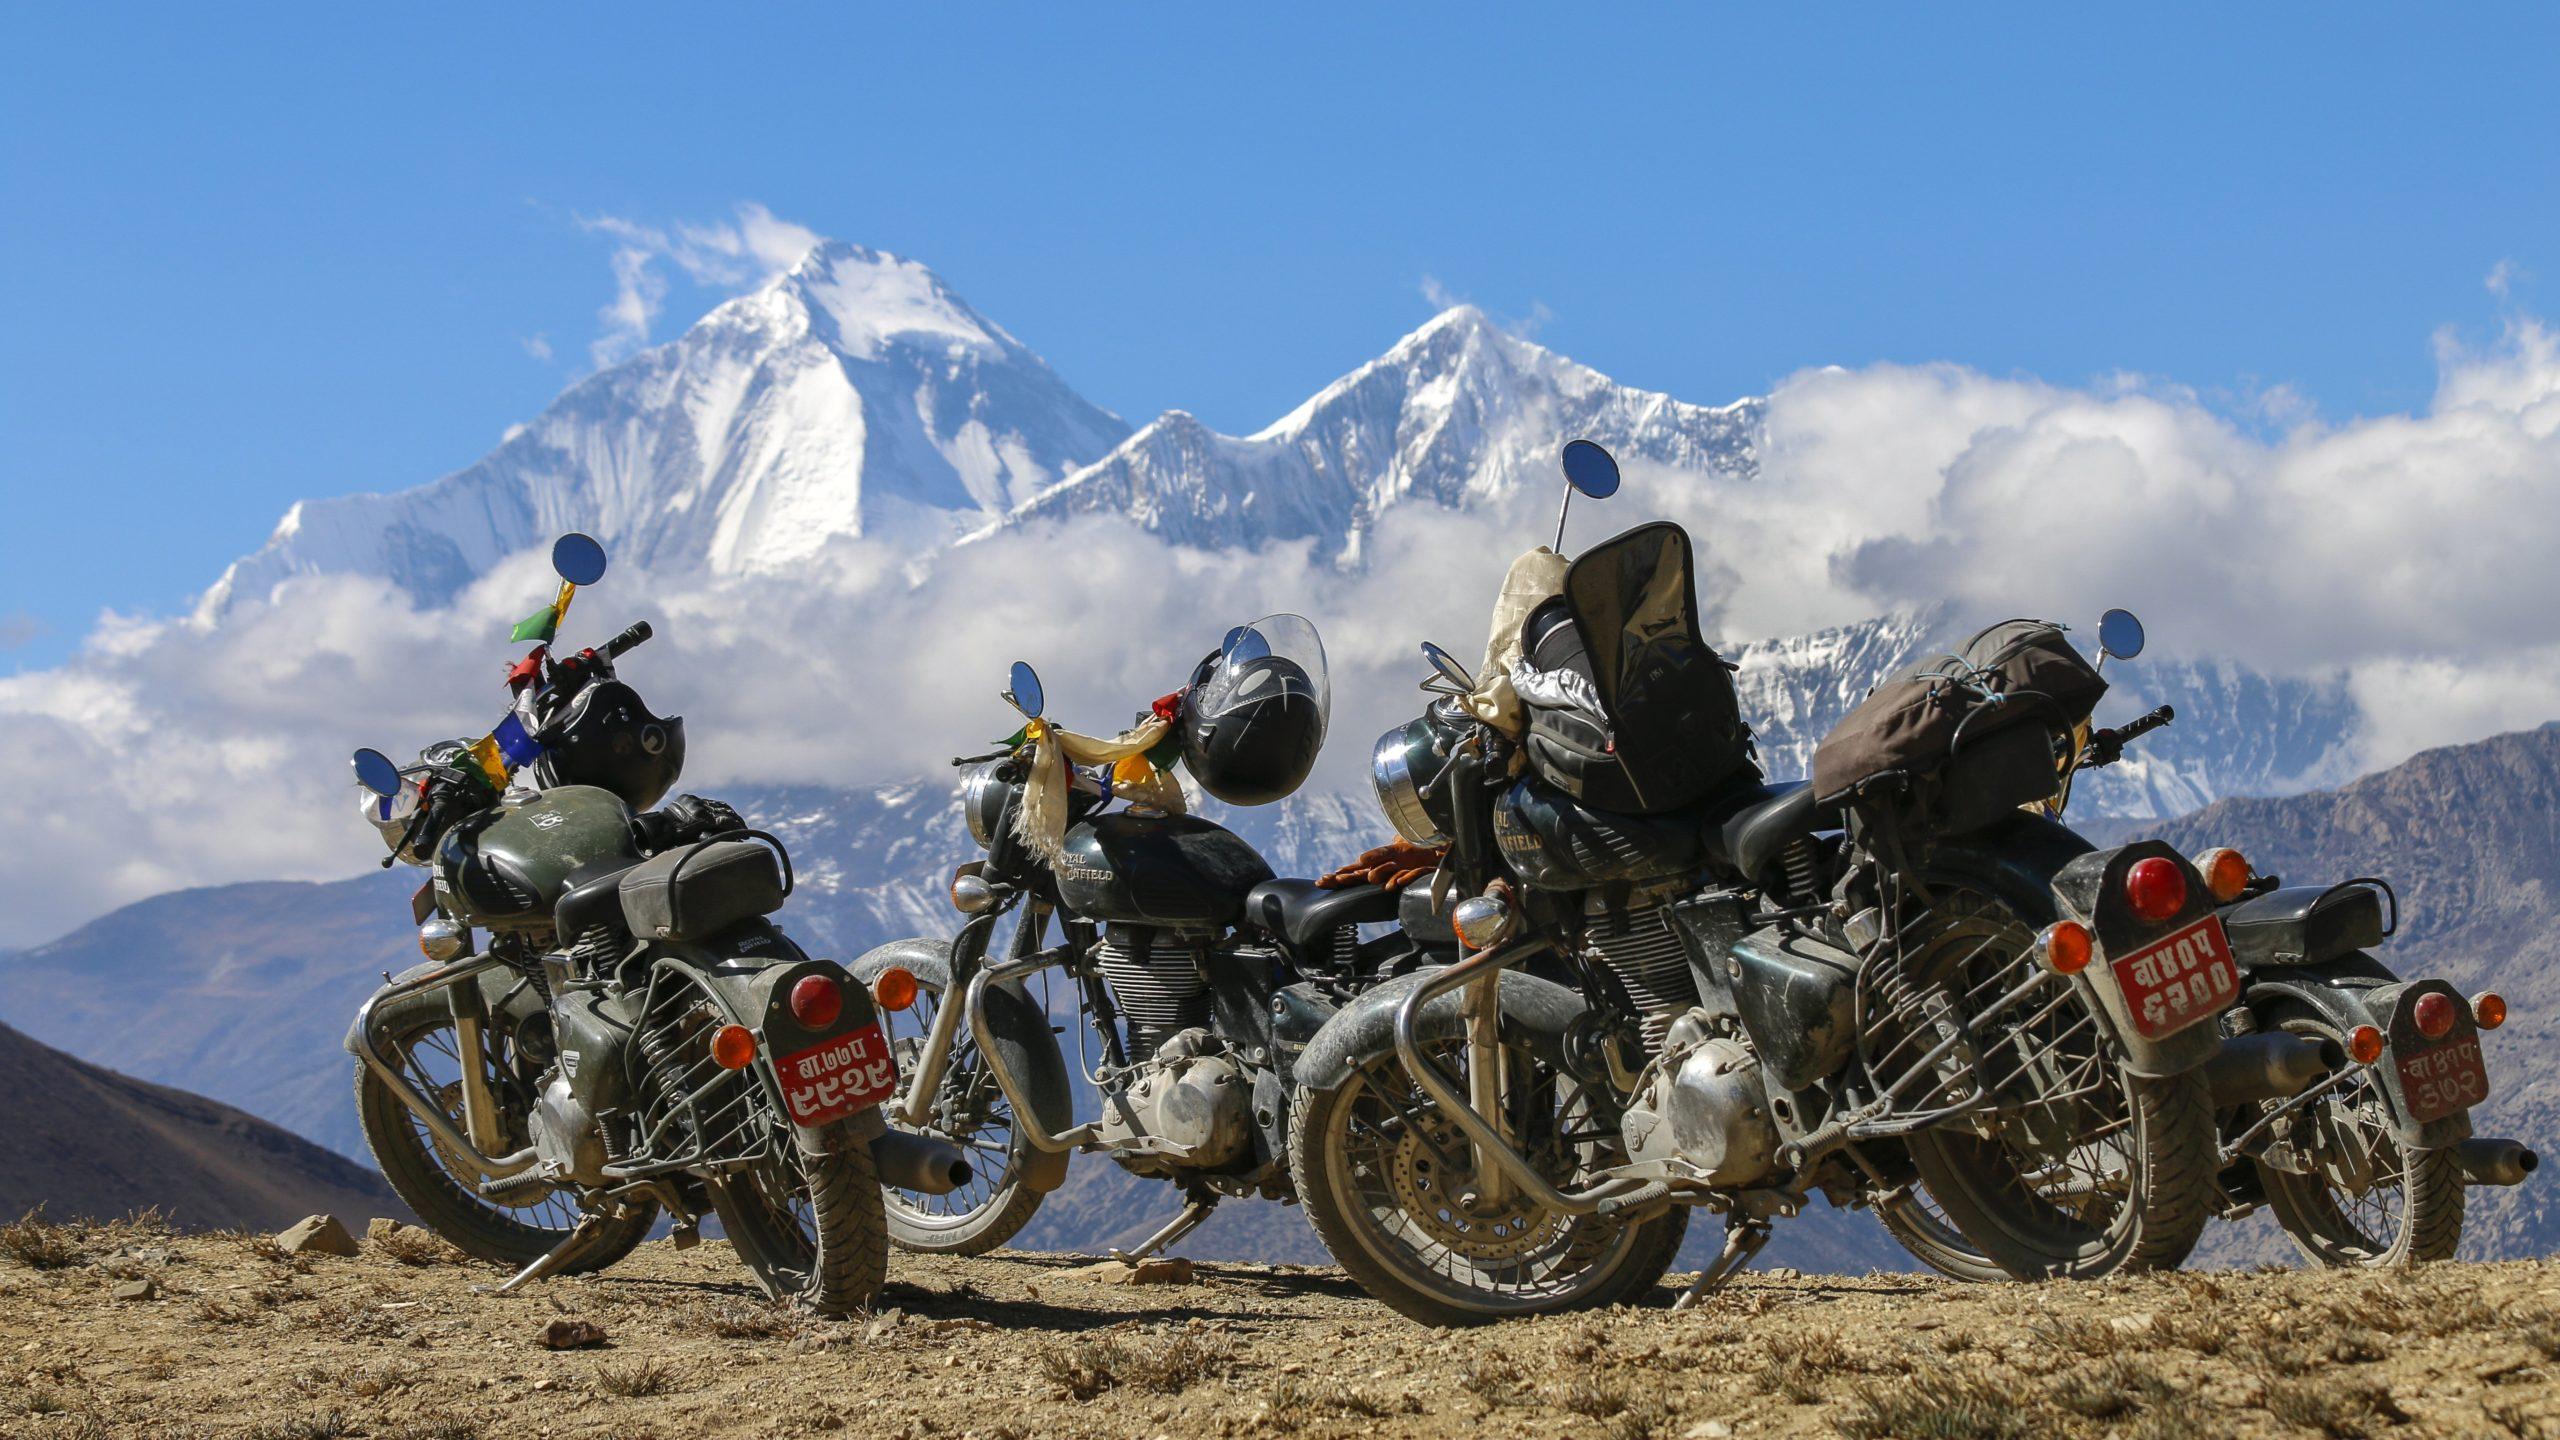 Motorcycle tour Nepal & Bhutan